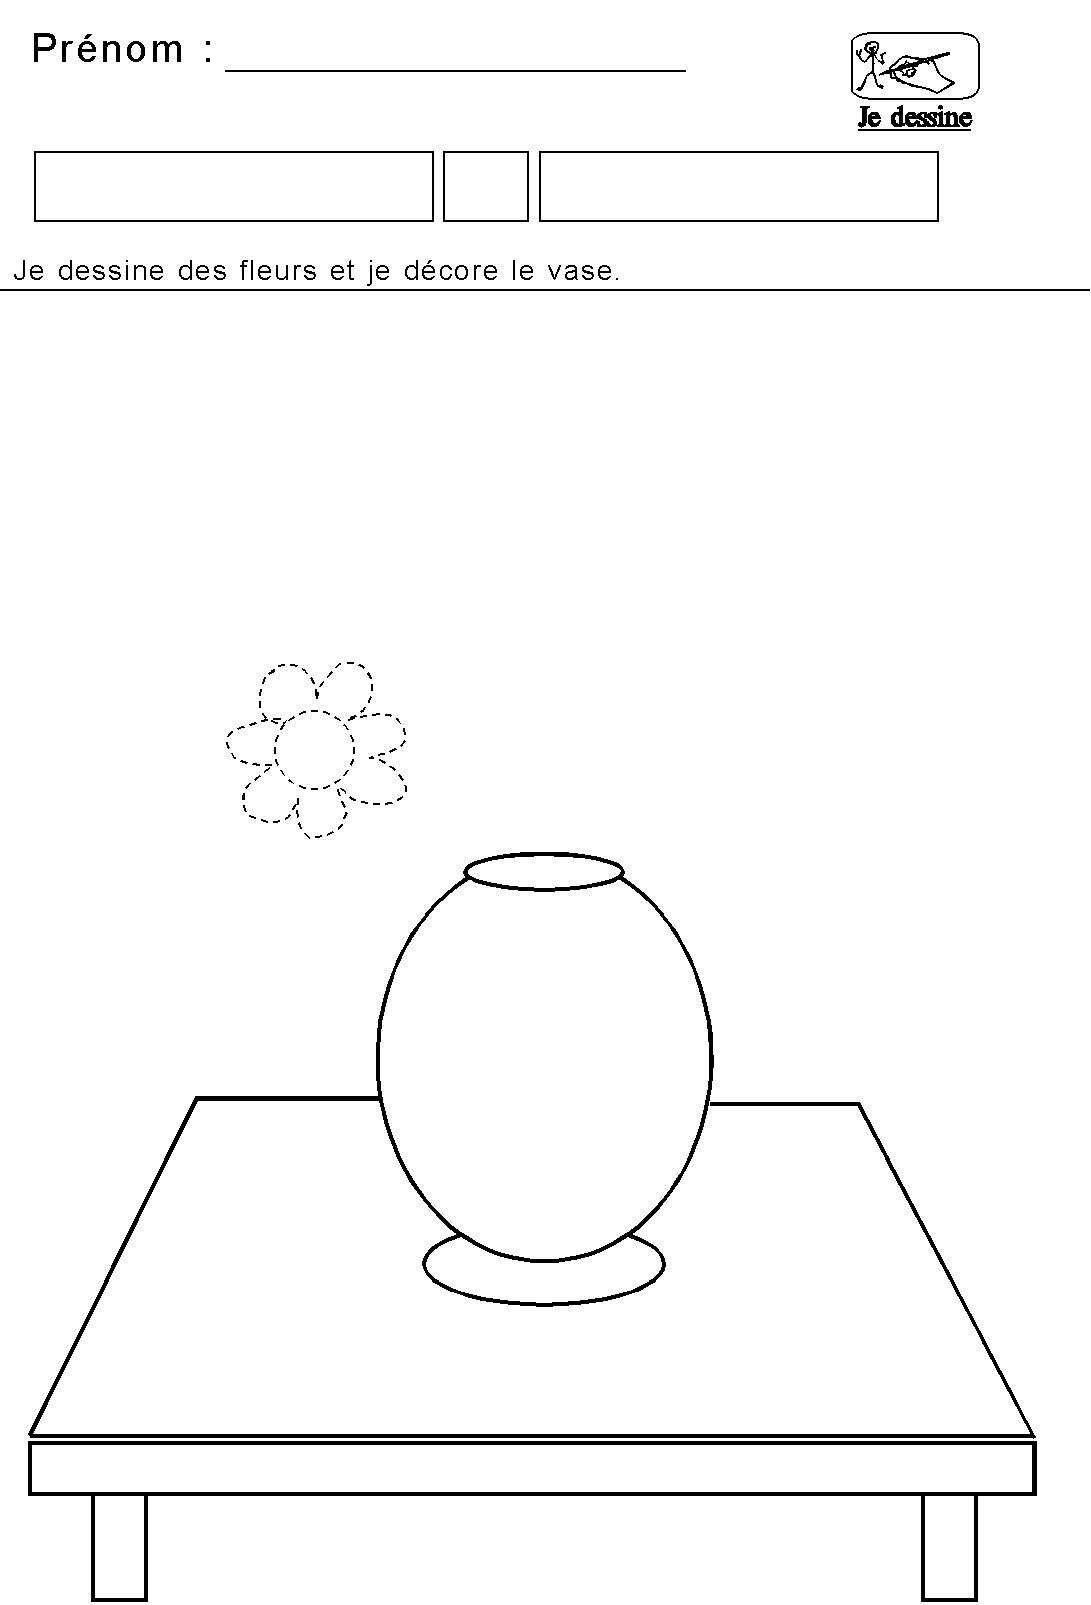 Coloriage graphisme ps coeur - Coloriage fleur britto ...